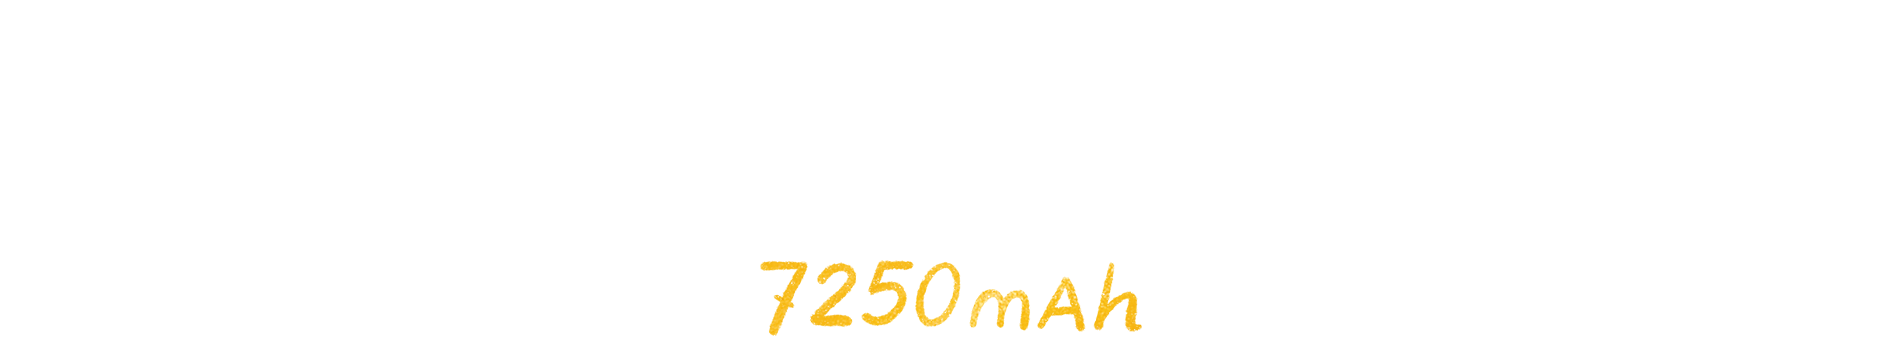 HUAWEI MatePad Battery